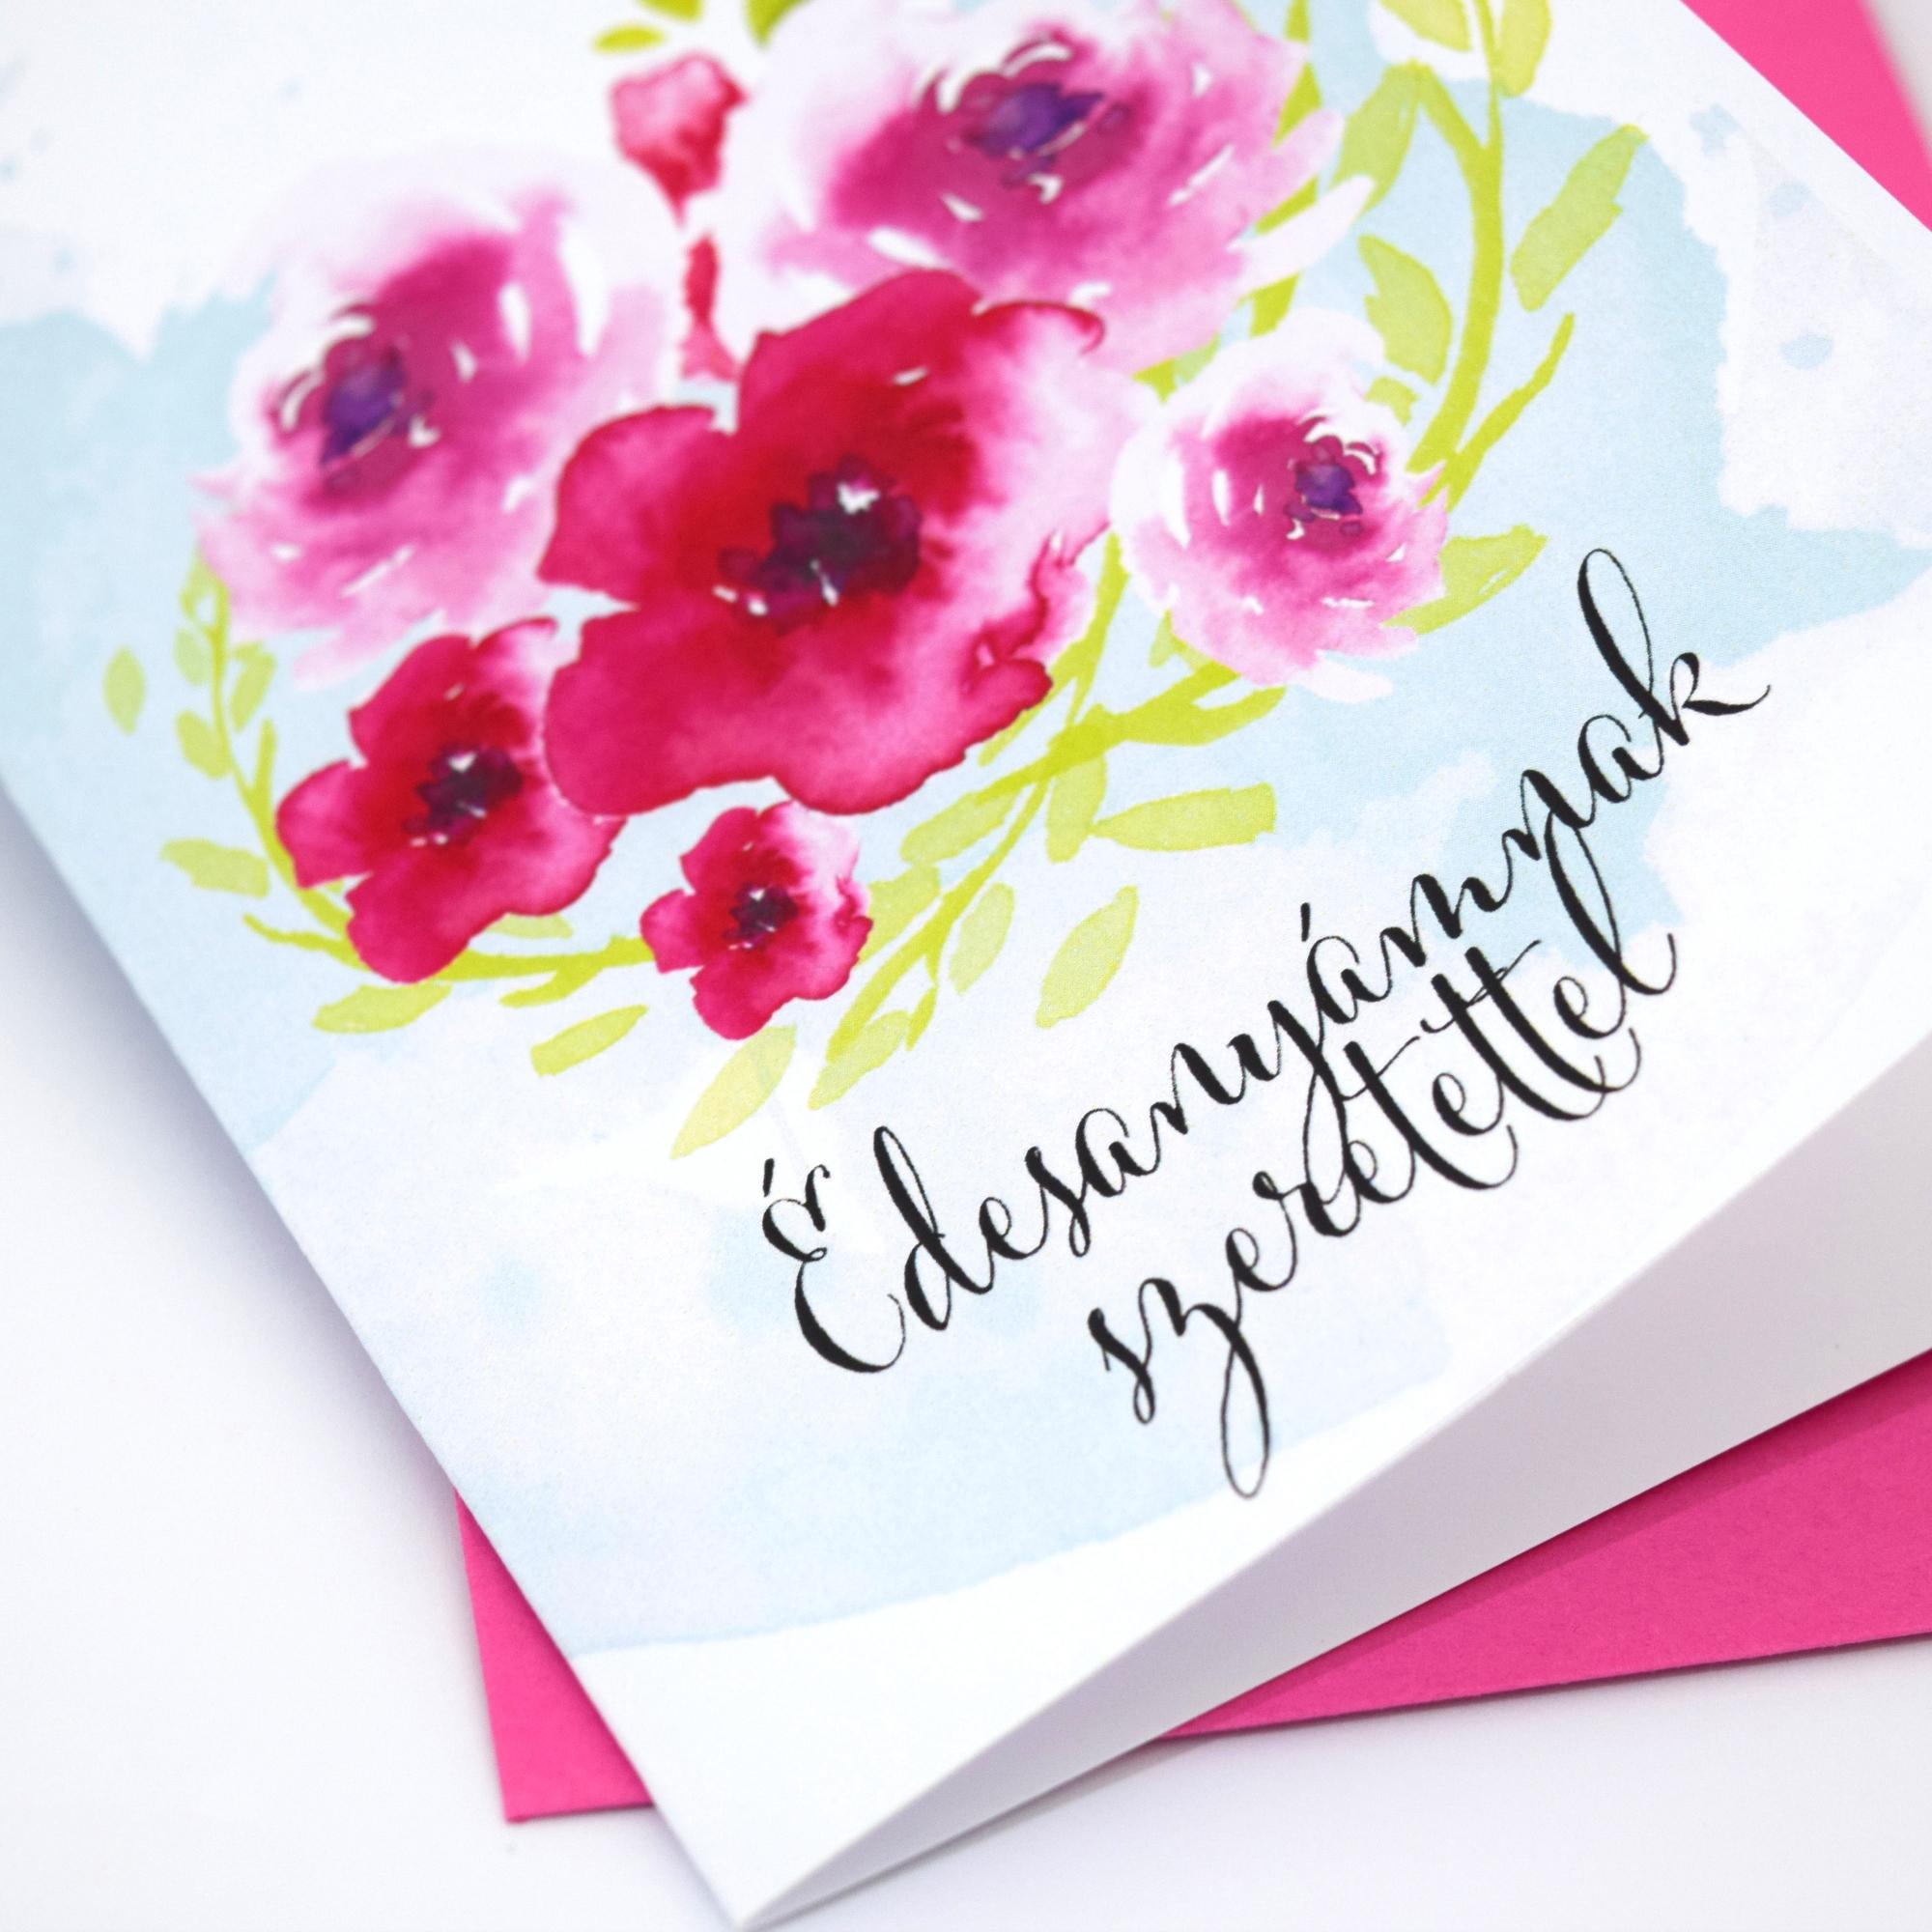 Handpainted, digitalised illustration and graphic design by Eva Farkas-Czifra.